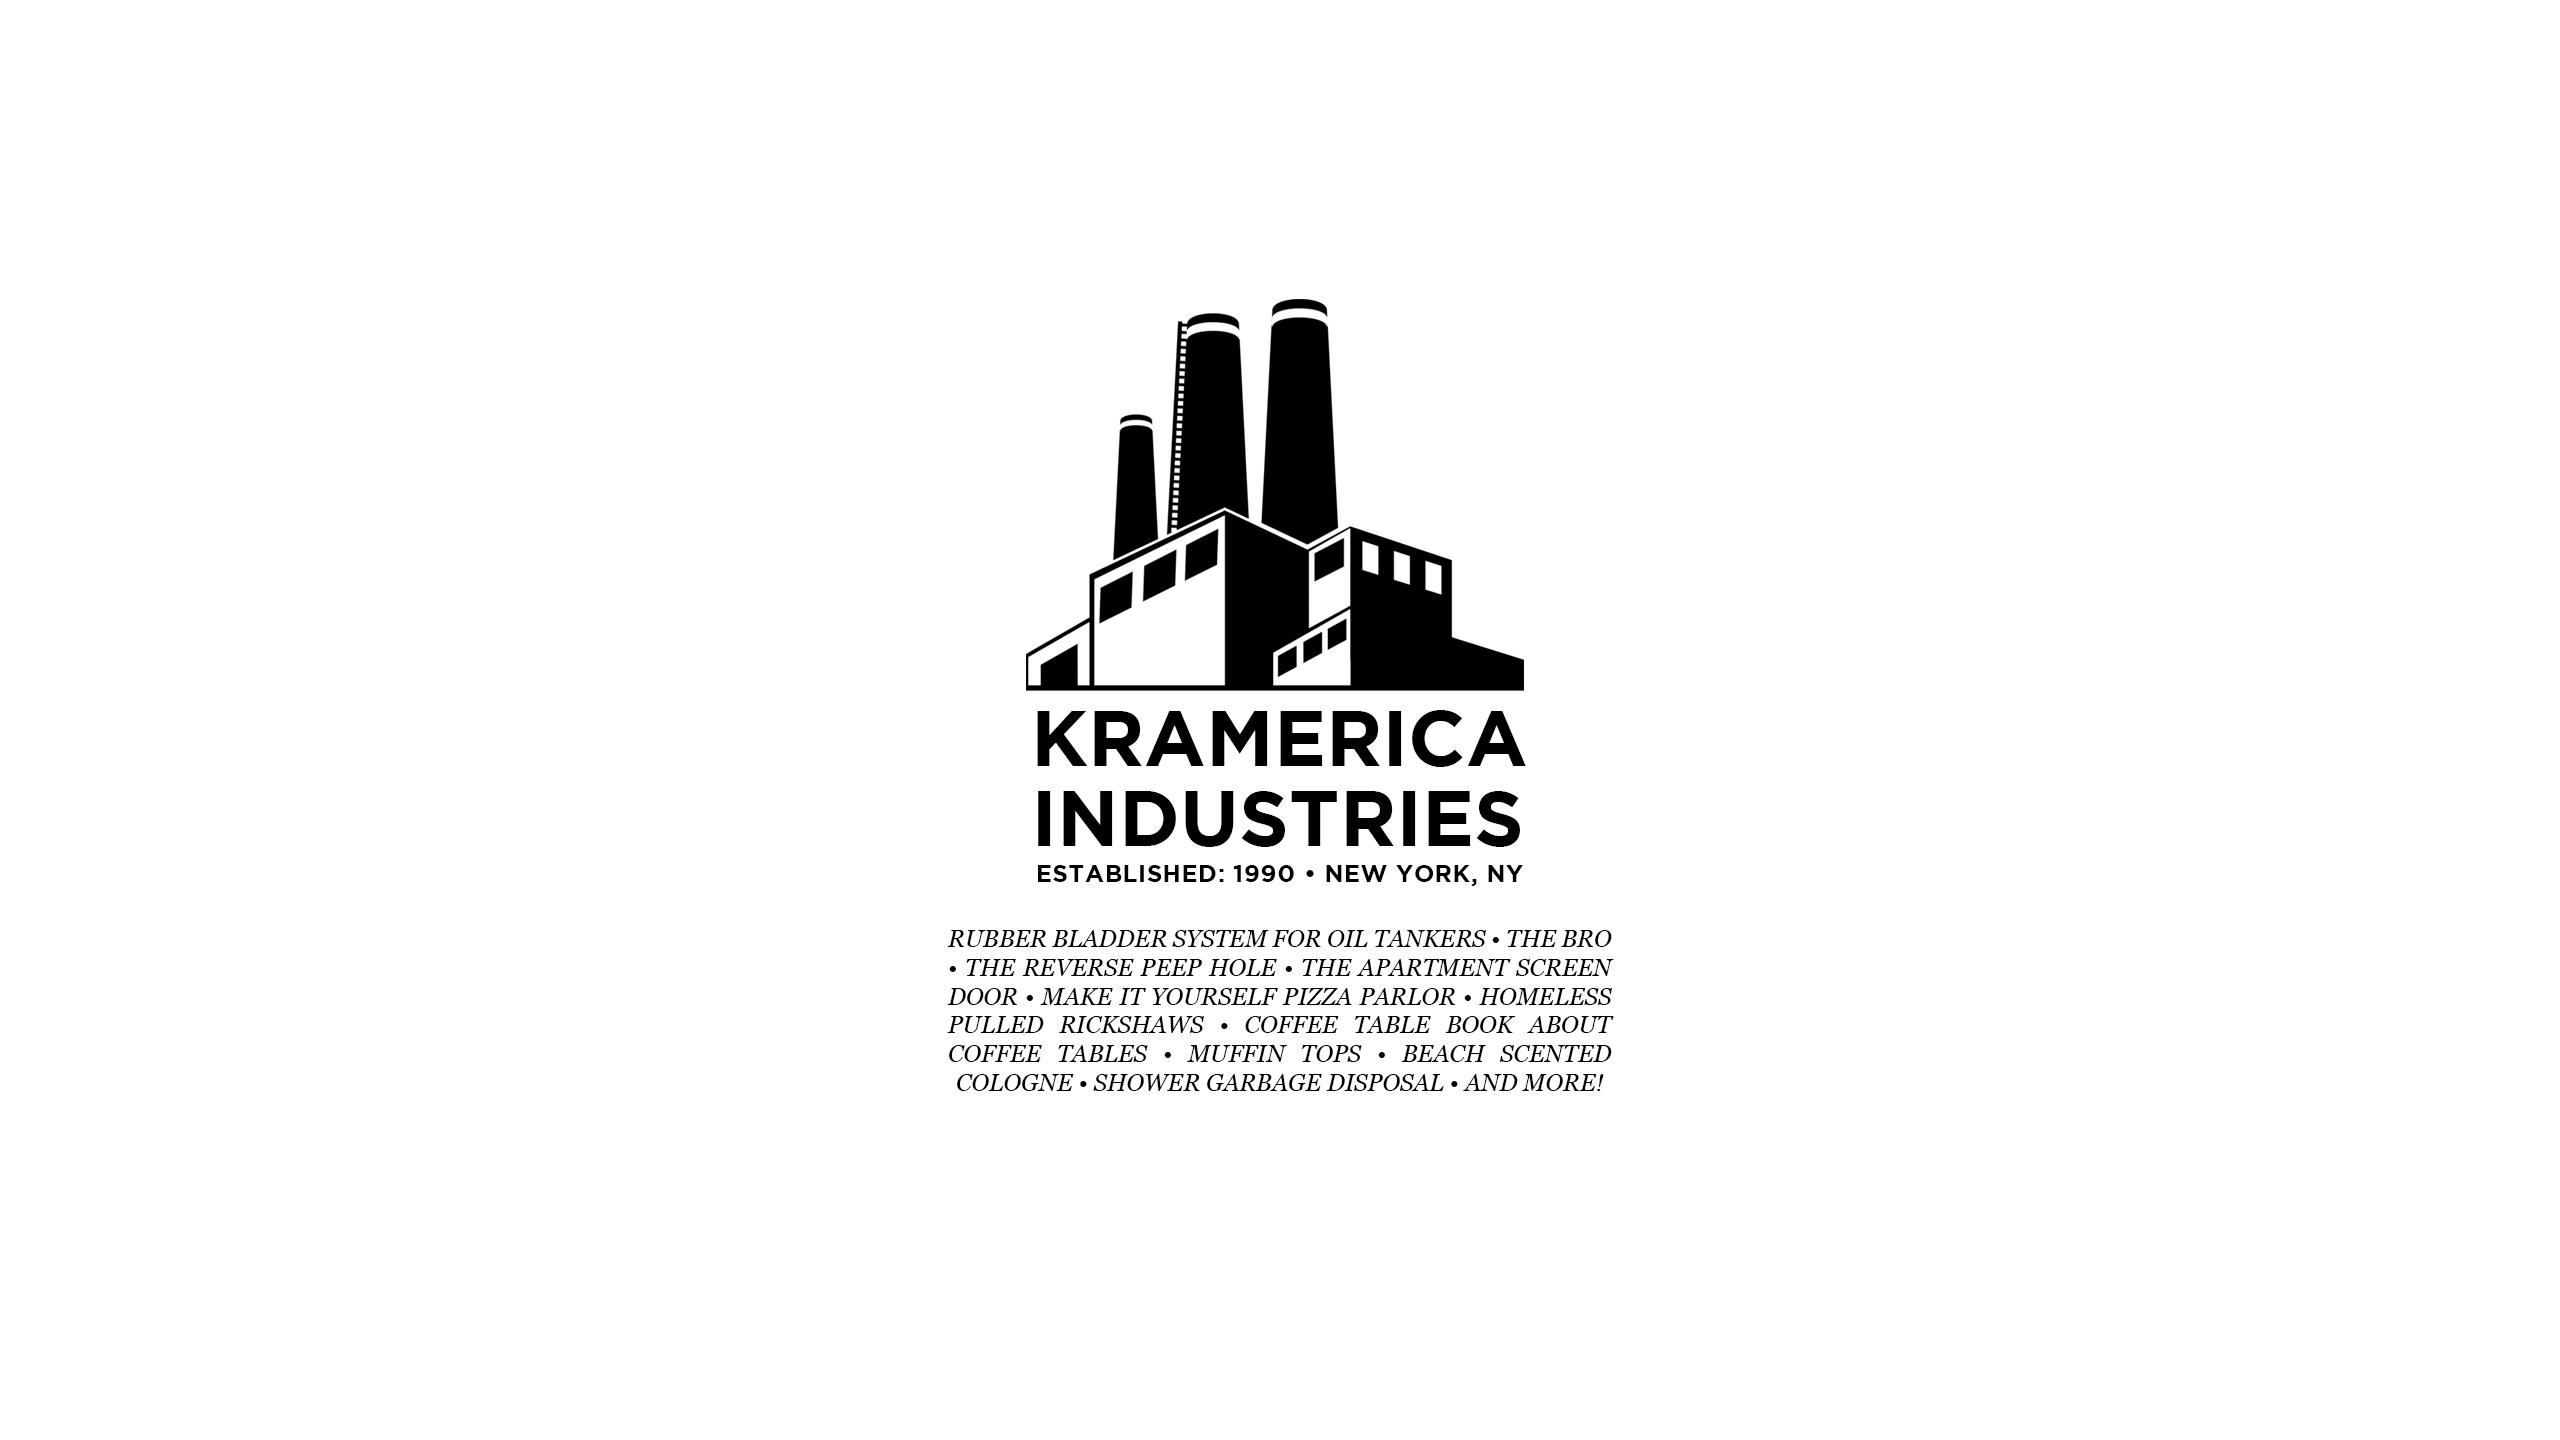 Seinfeld - Kramerica Industries